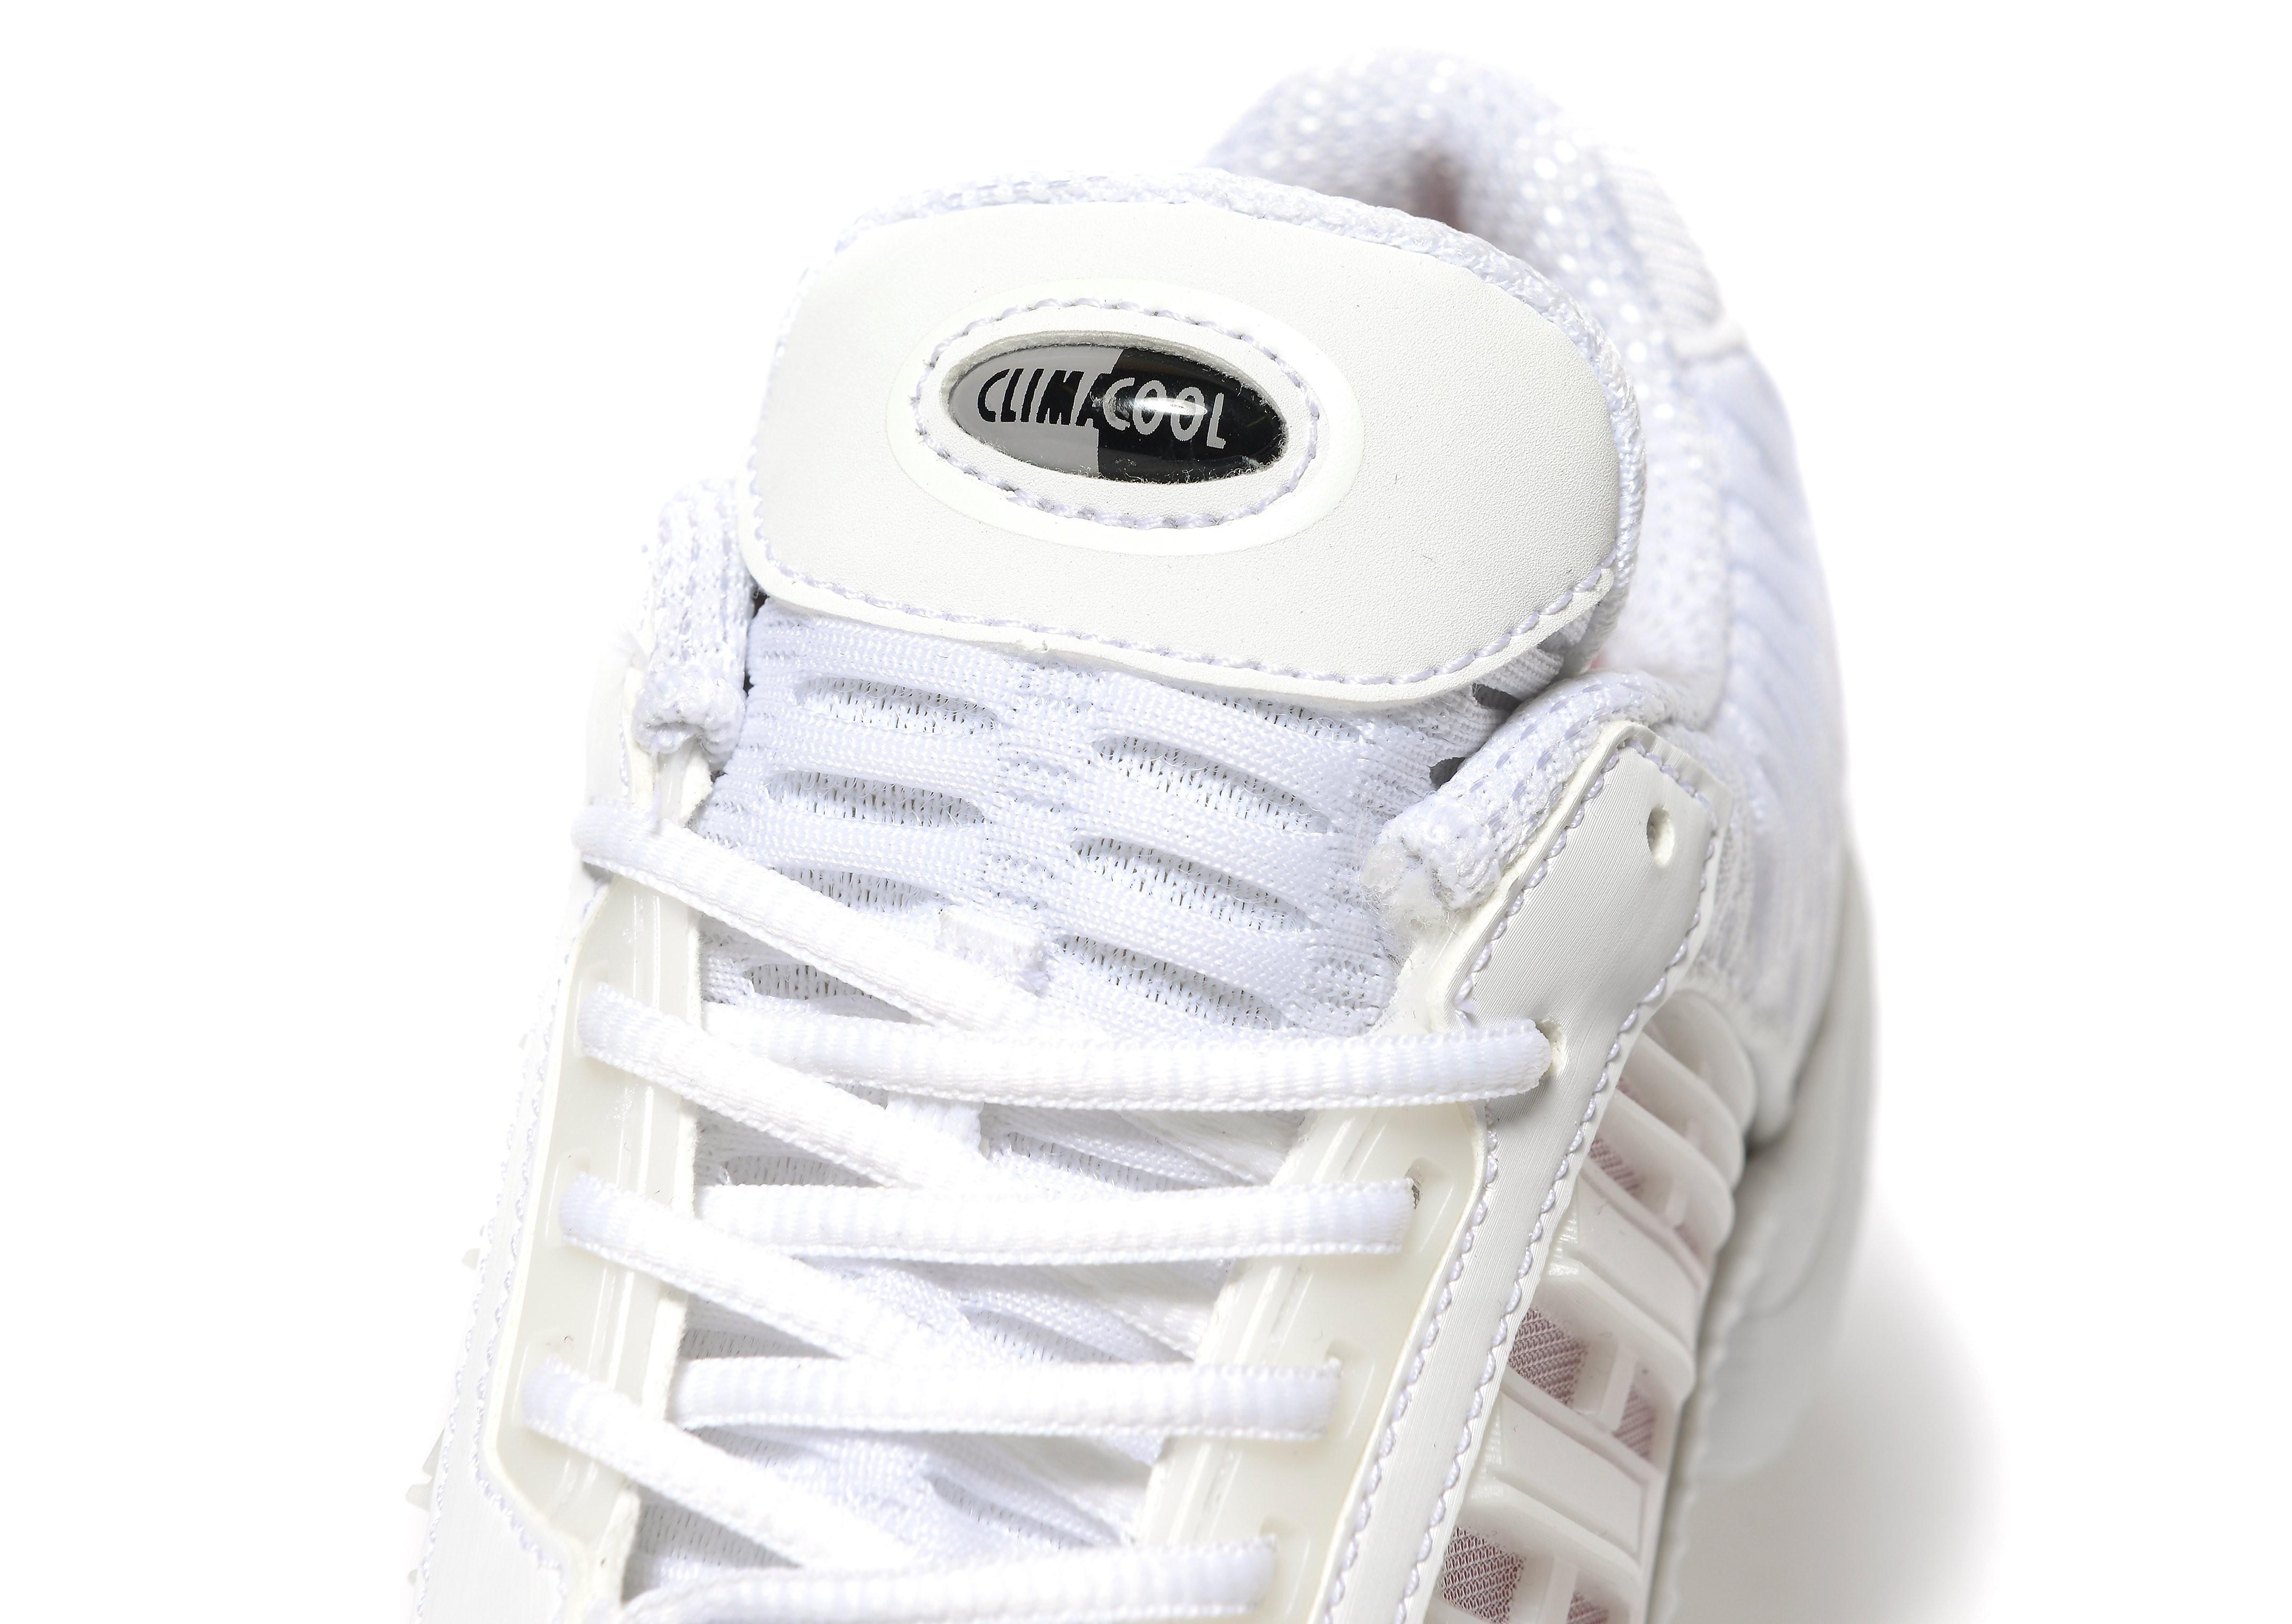 adidas Originals Climacool 1 Children